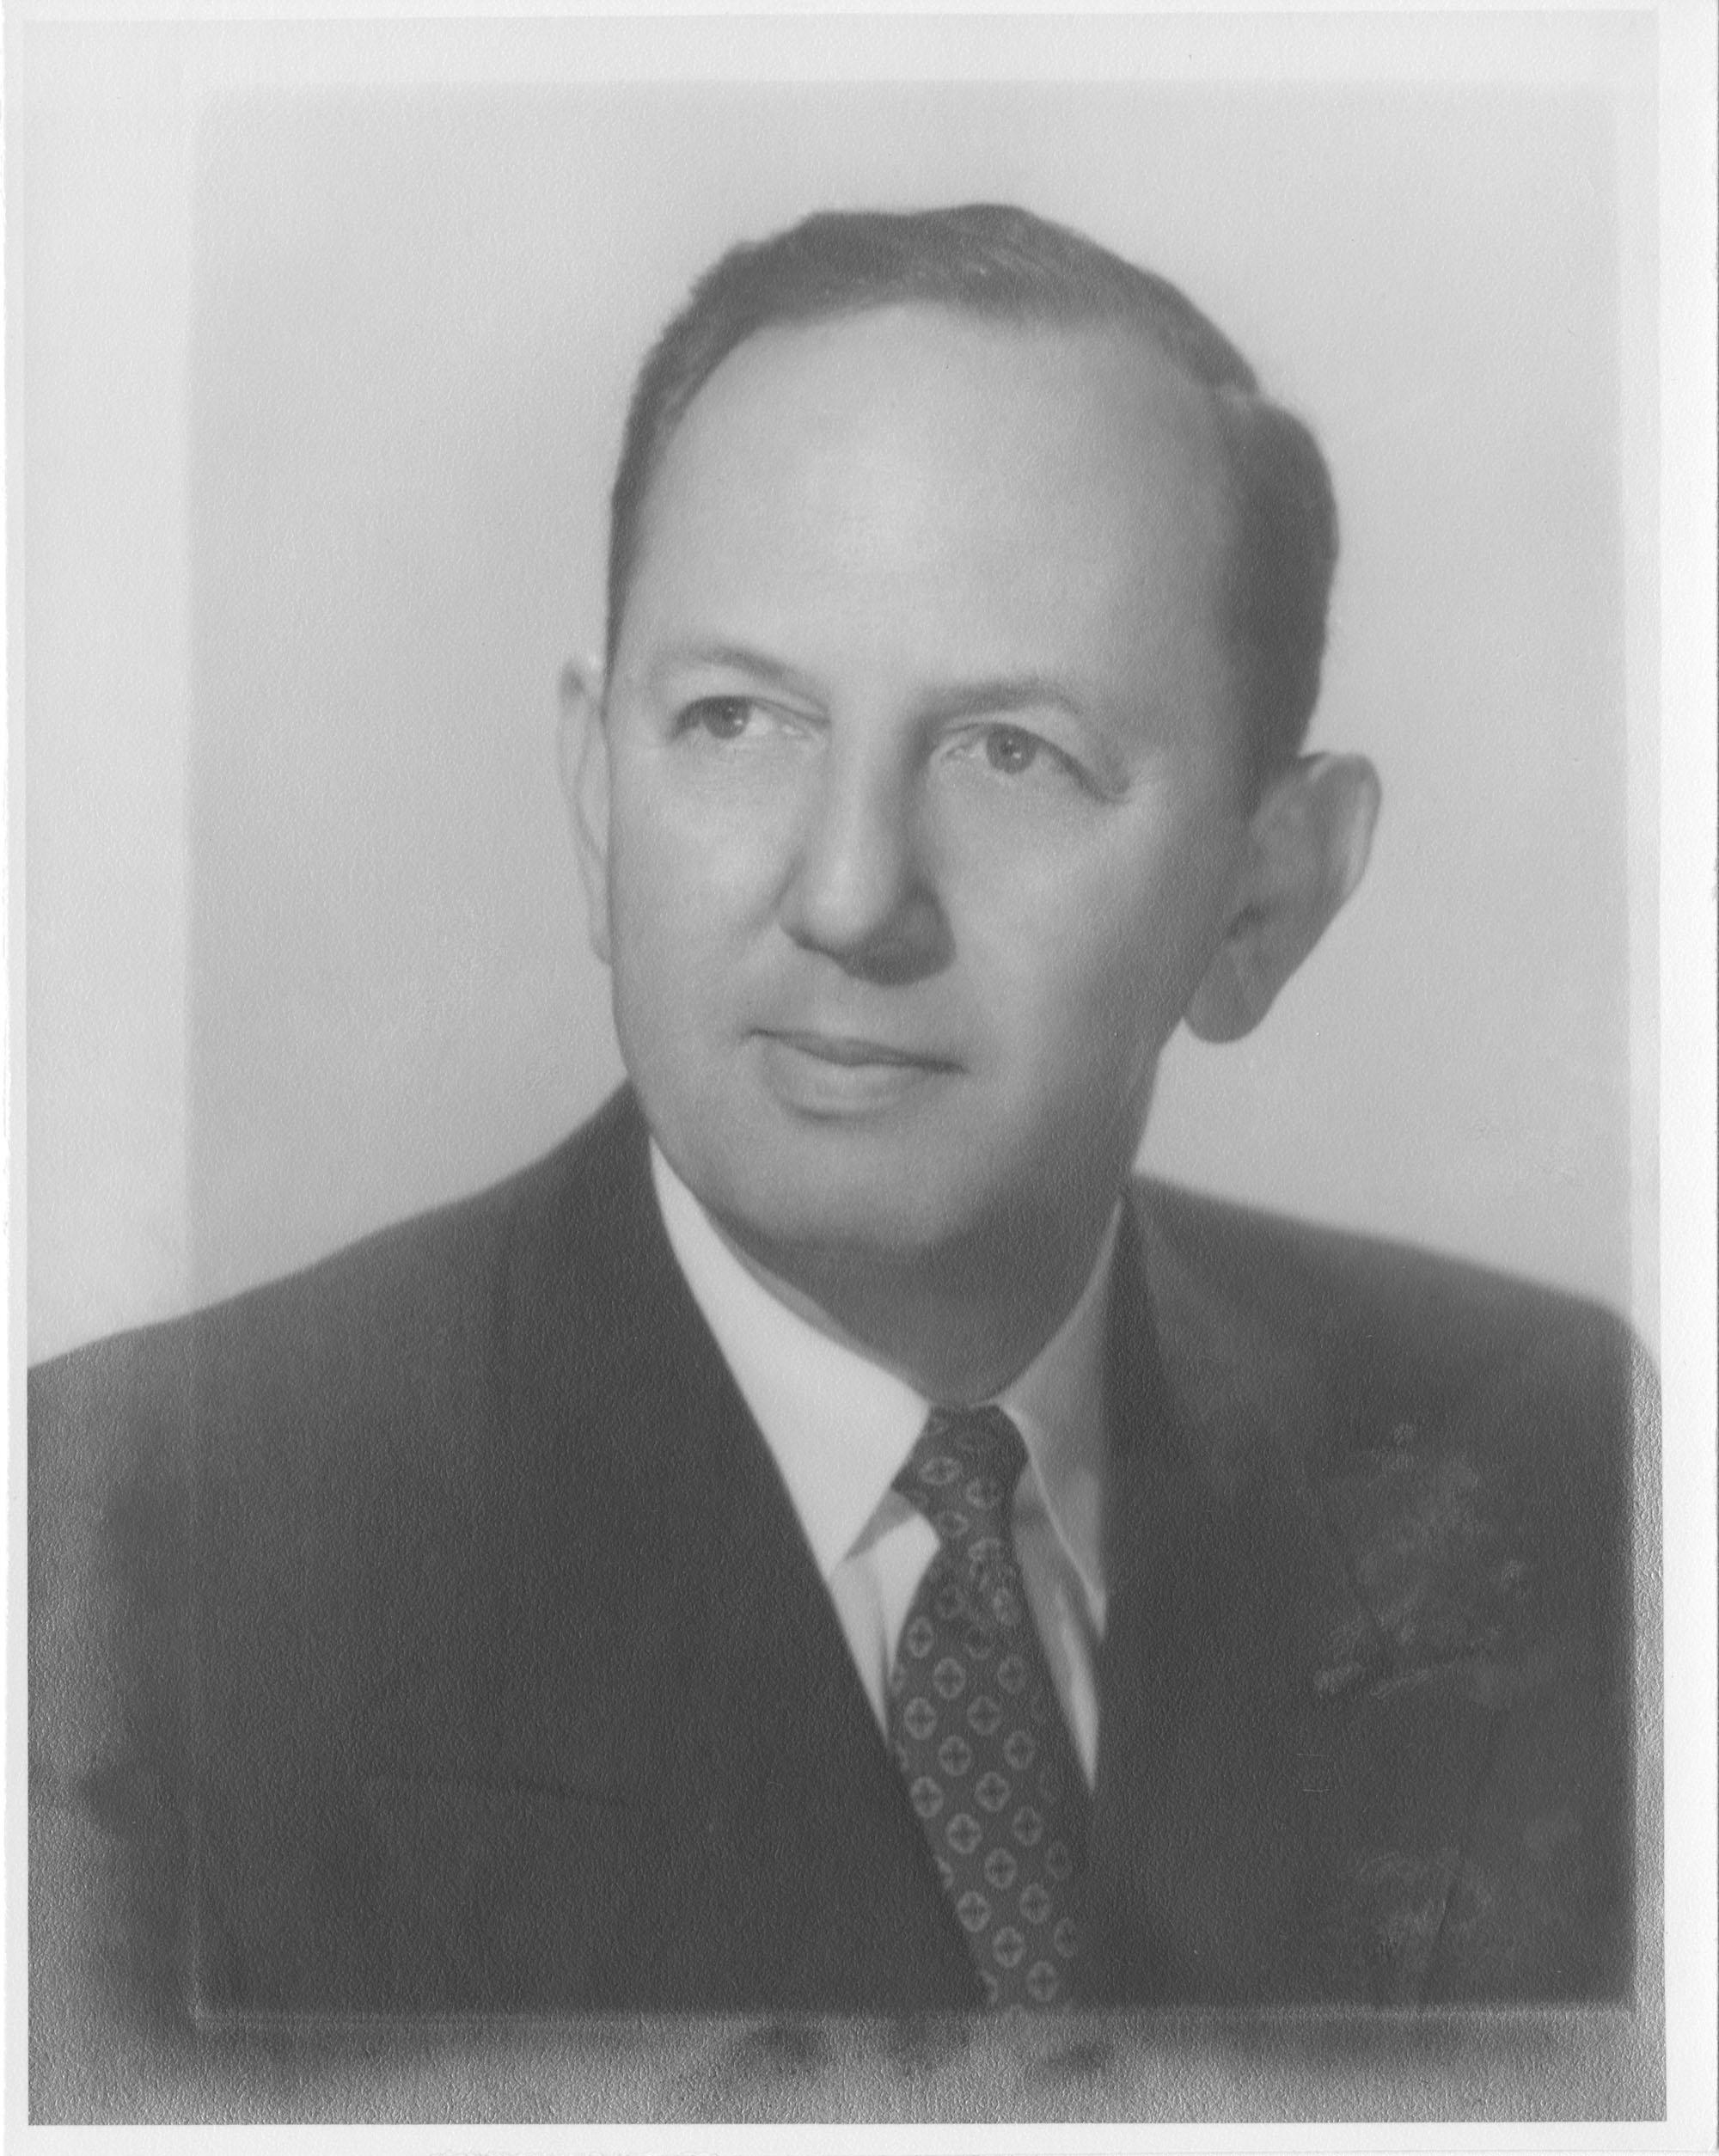 G. Creighton Frampton